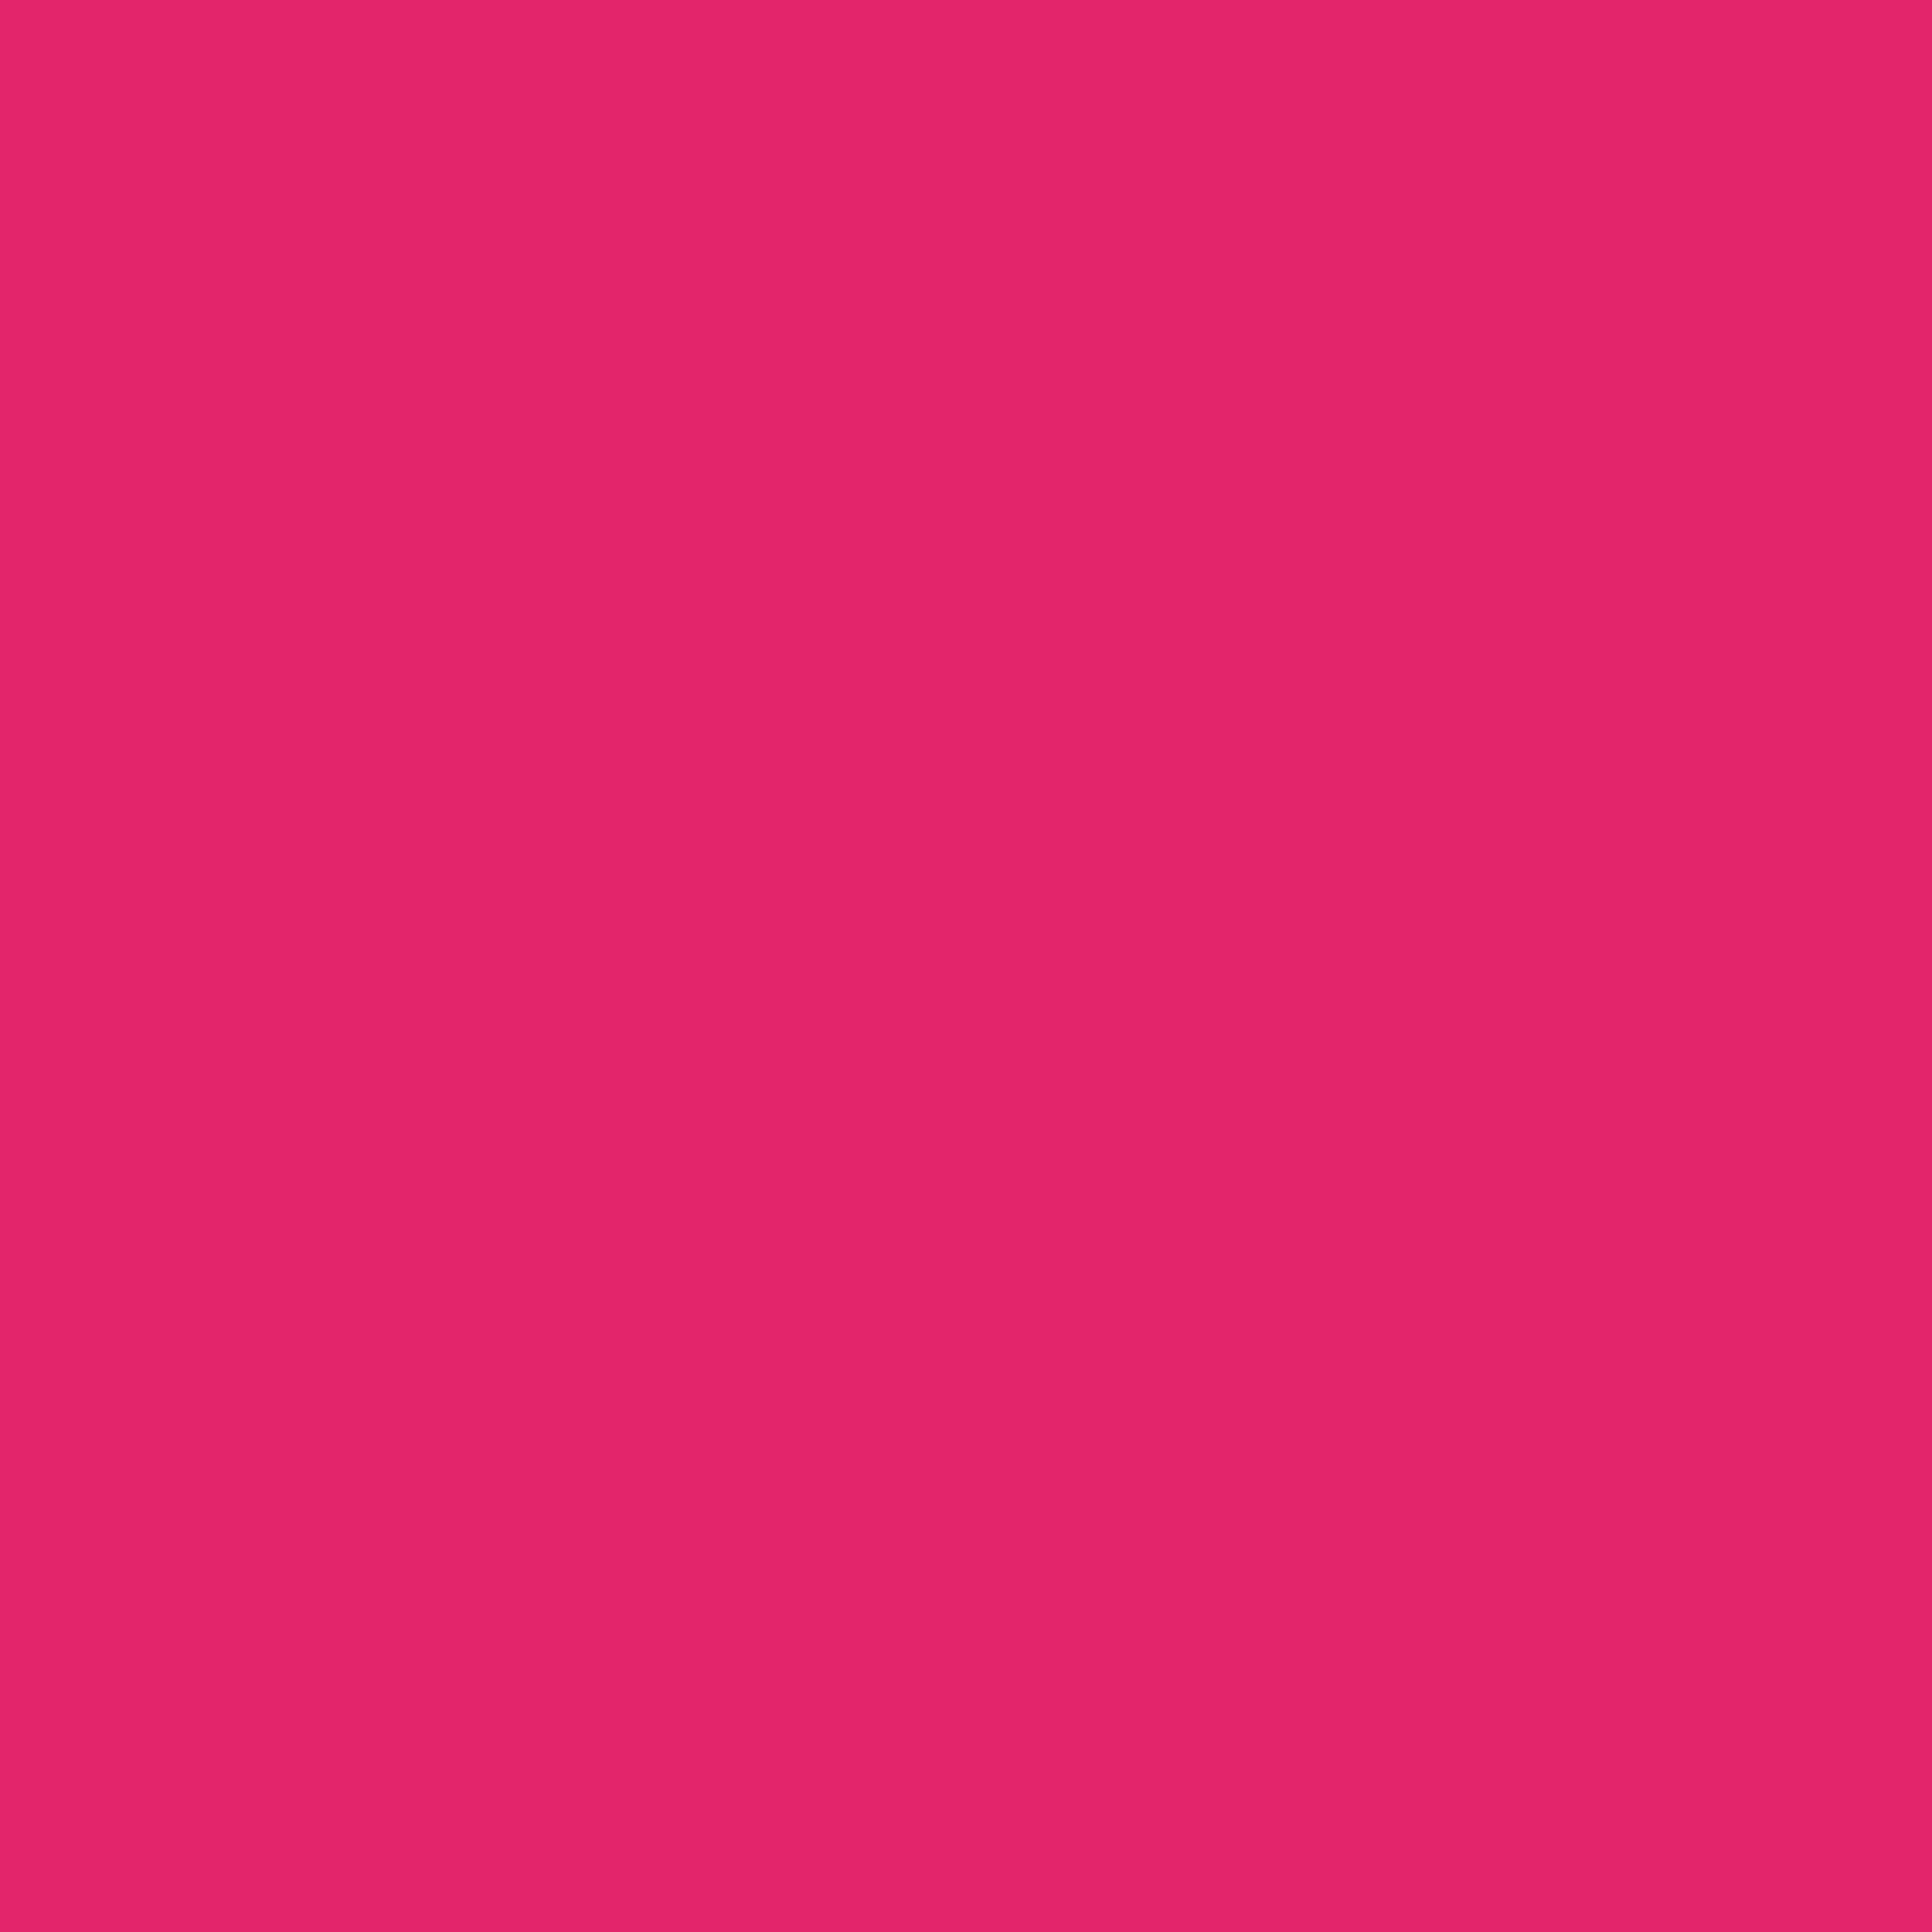 2048x2048 Razzmatazz Solid Color Background